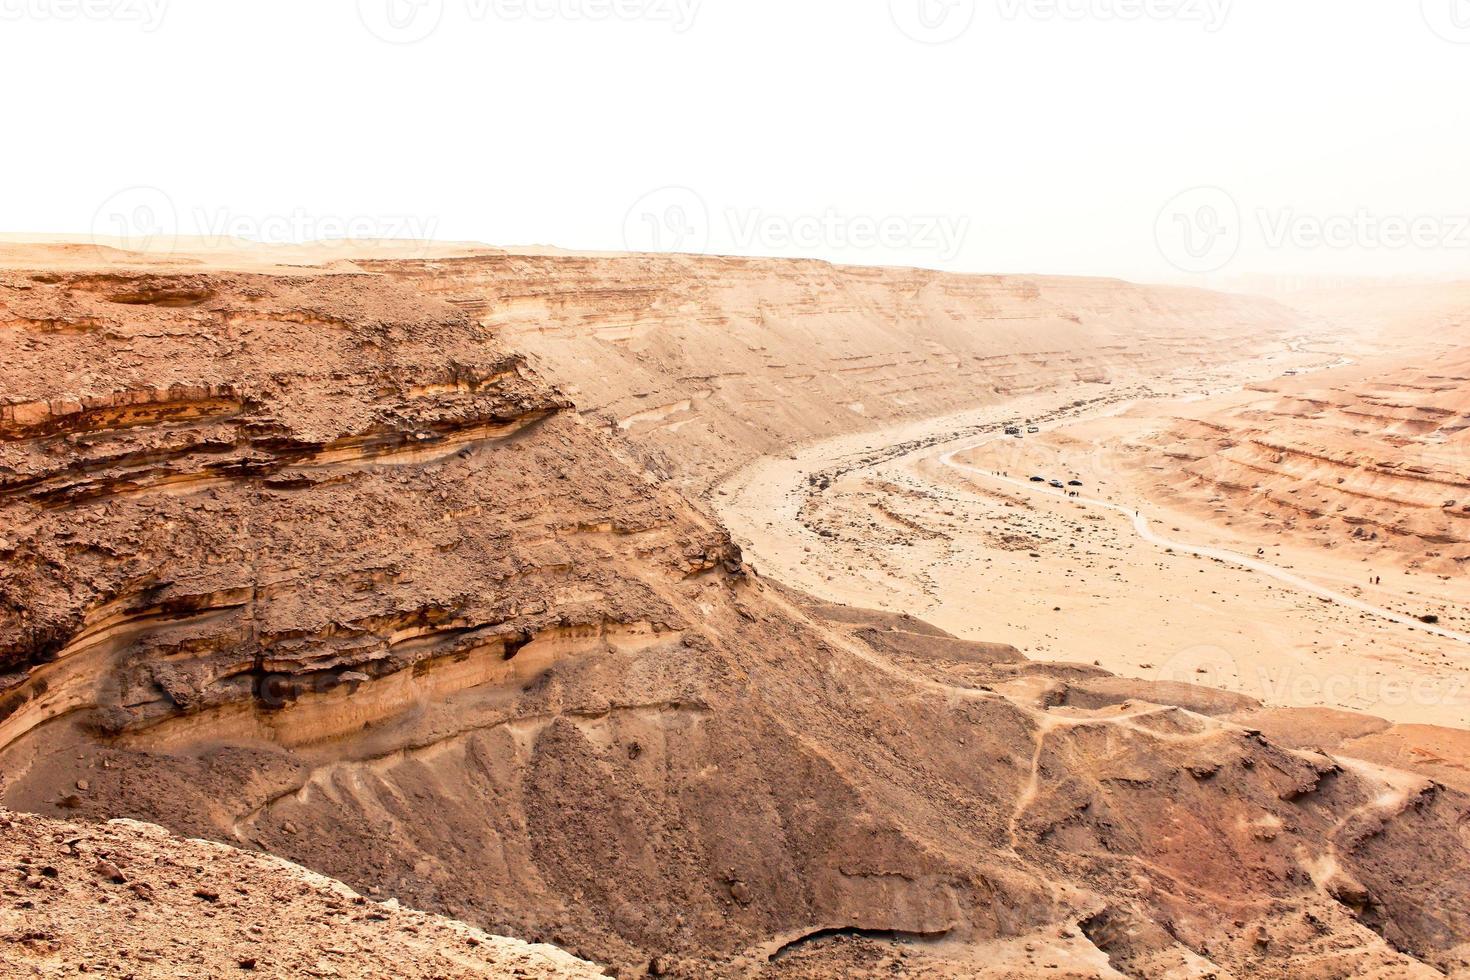 das Wüsten-Elrayan-Tal Sahara foto